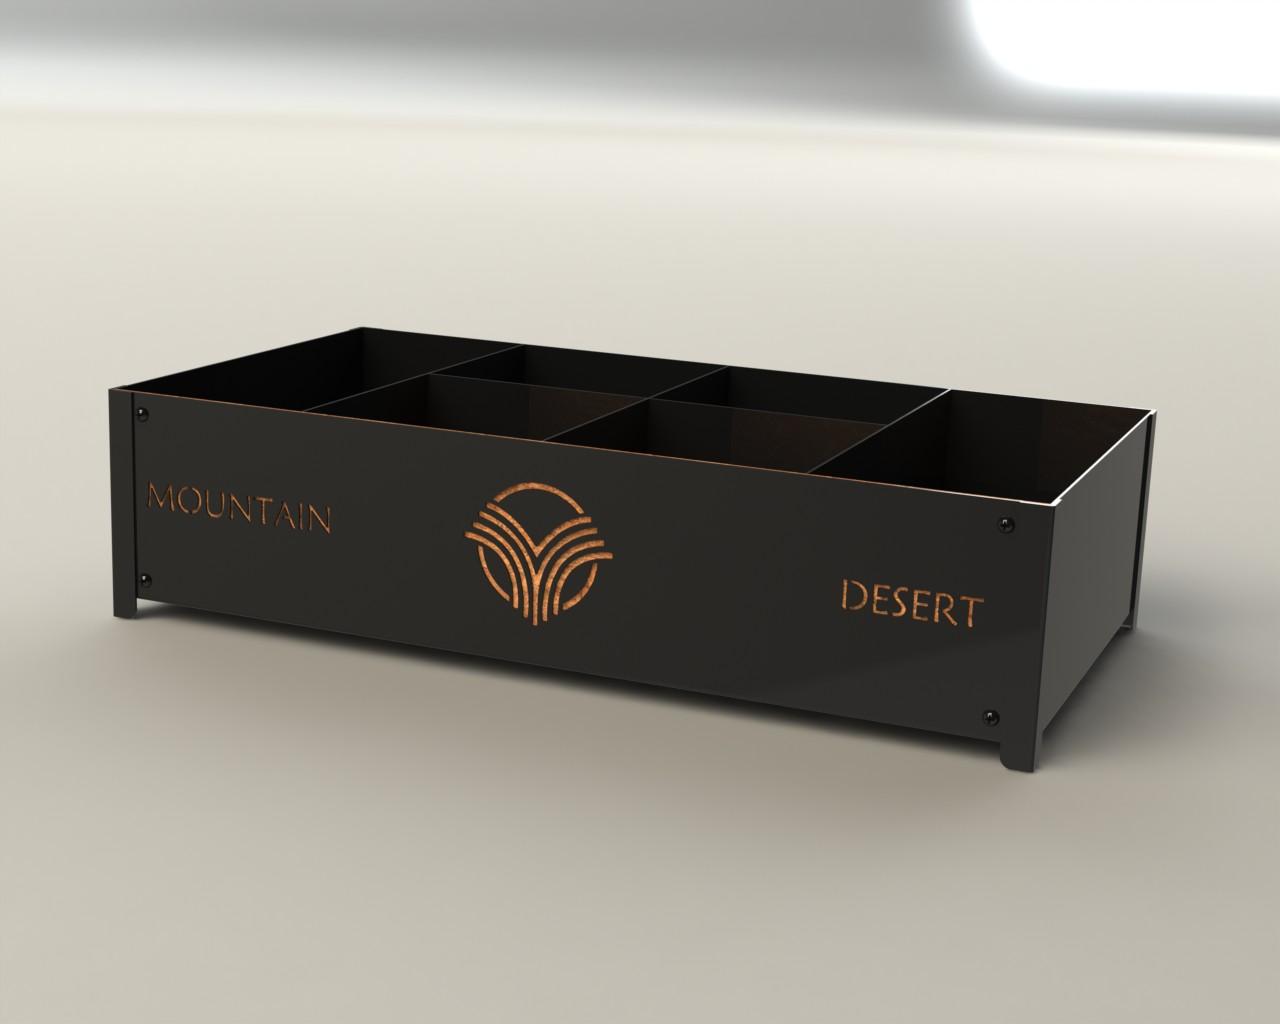 Tournament Amenities Box